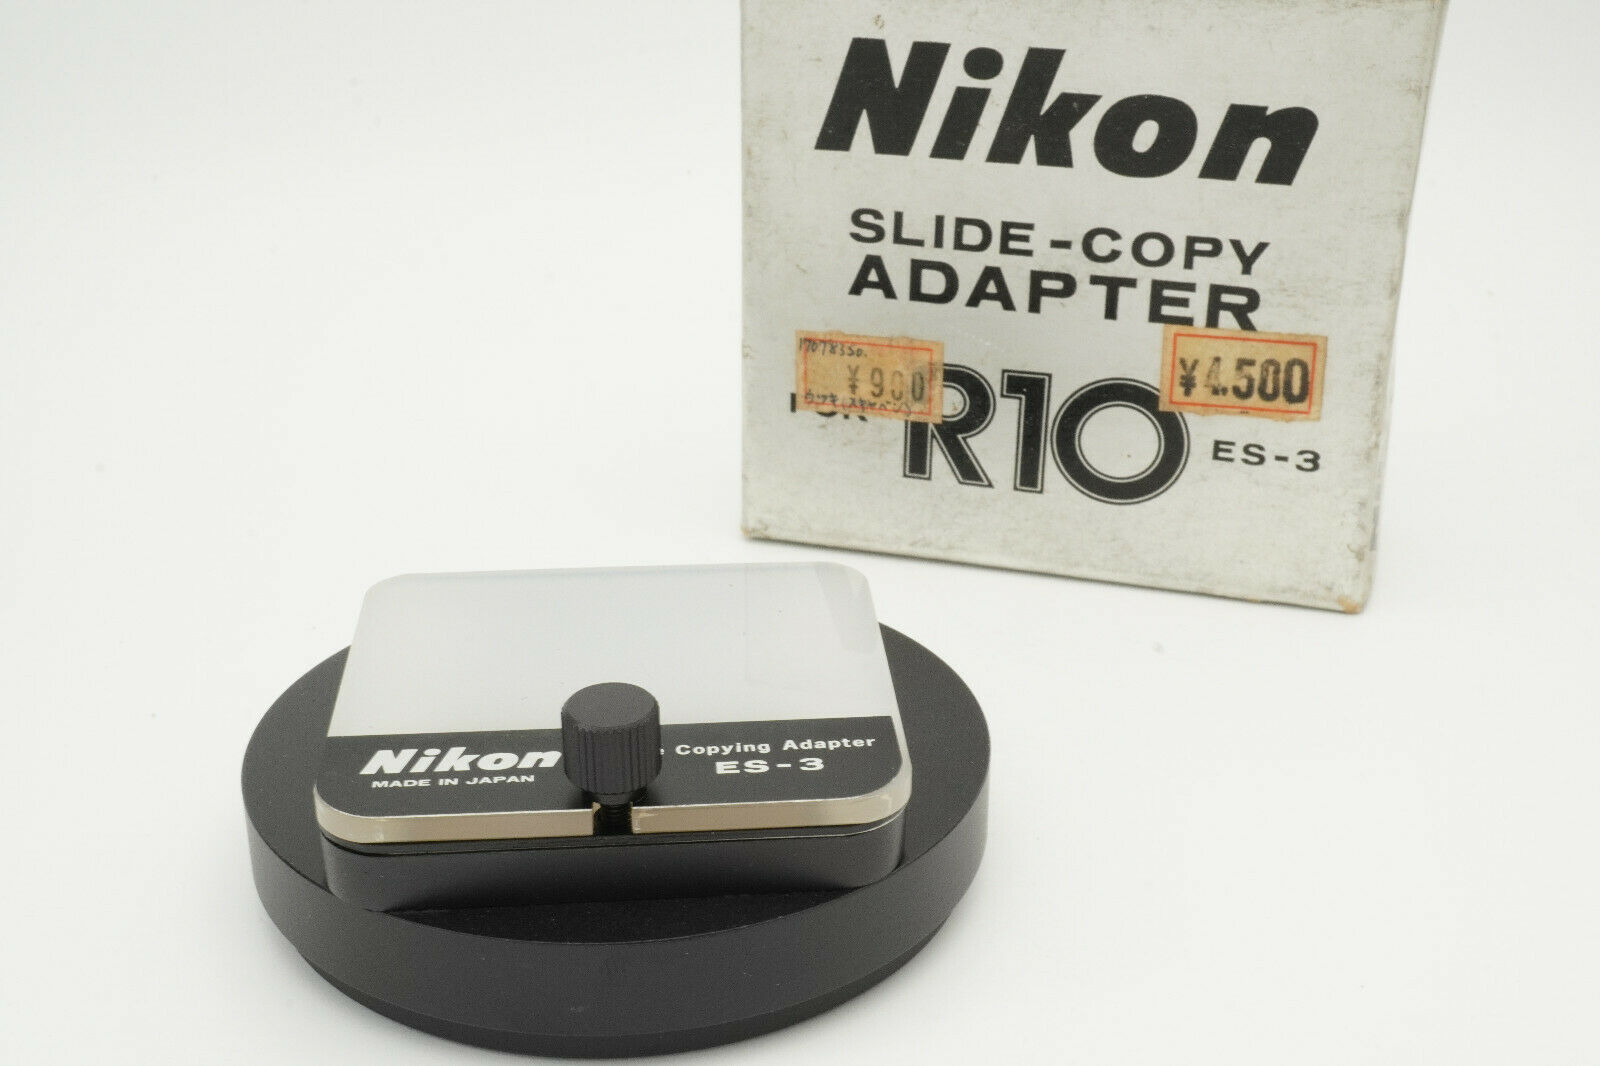 [Unused in box] NIKON Slide-Copy Adapter for R10 ES-3 from Japan #B002